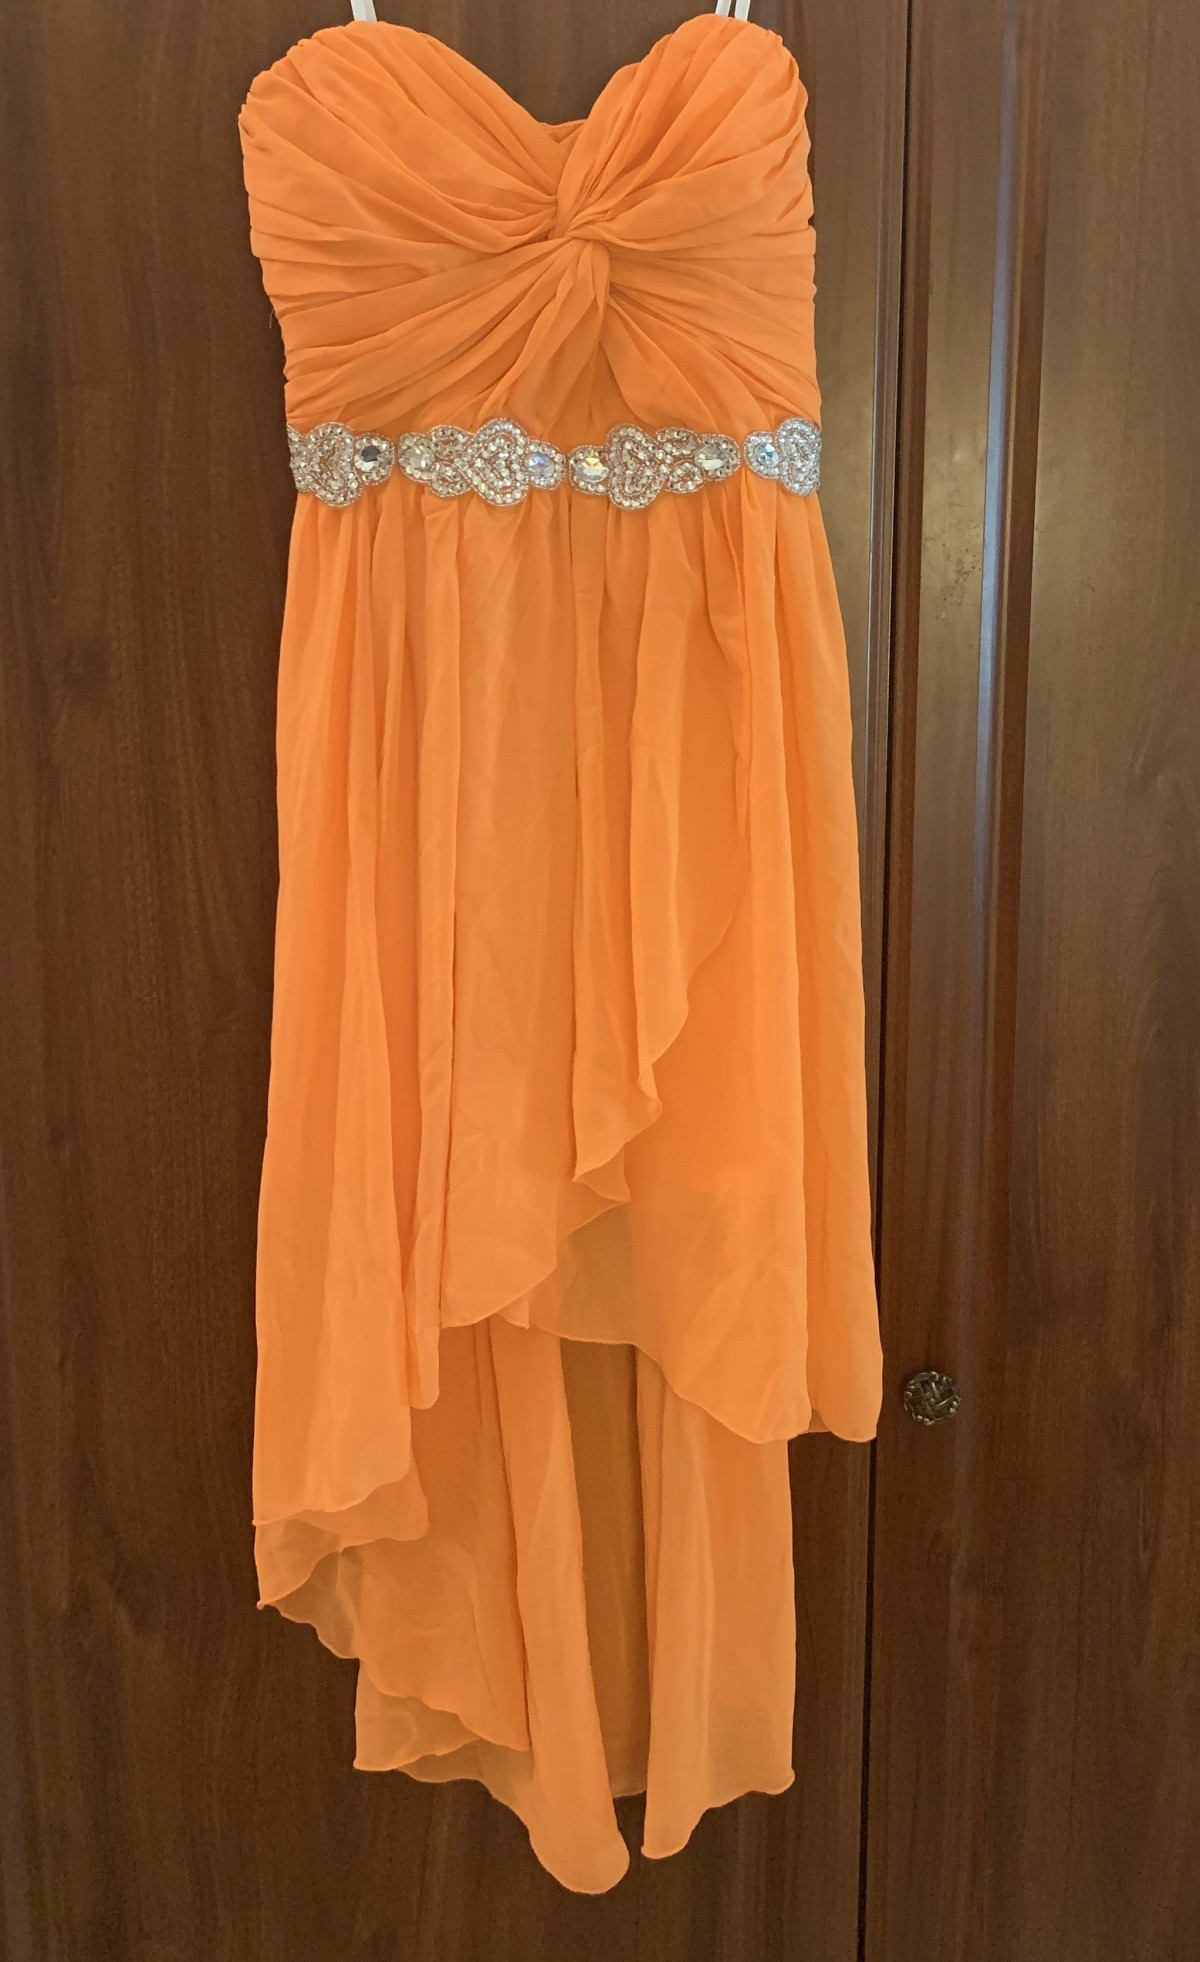 Orange sequined dress